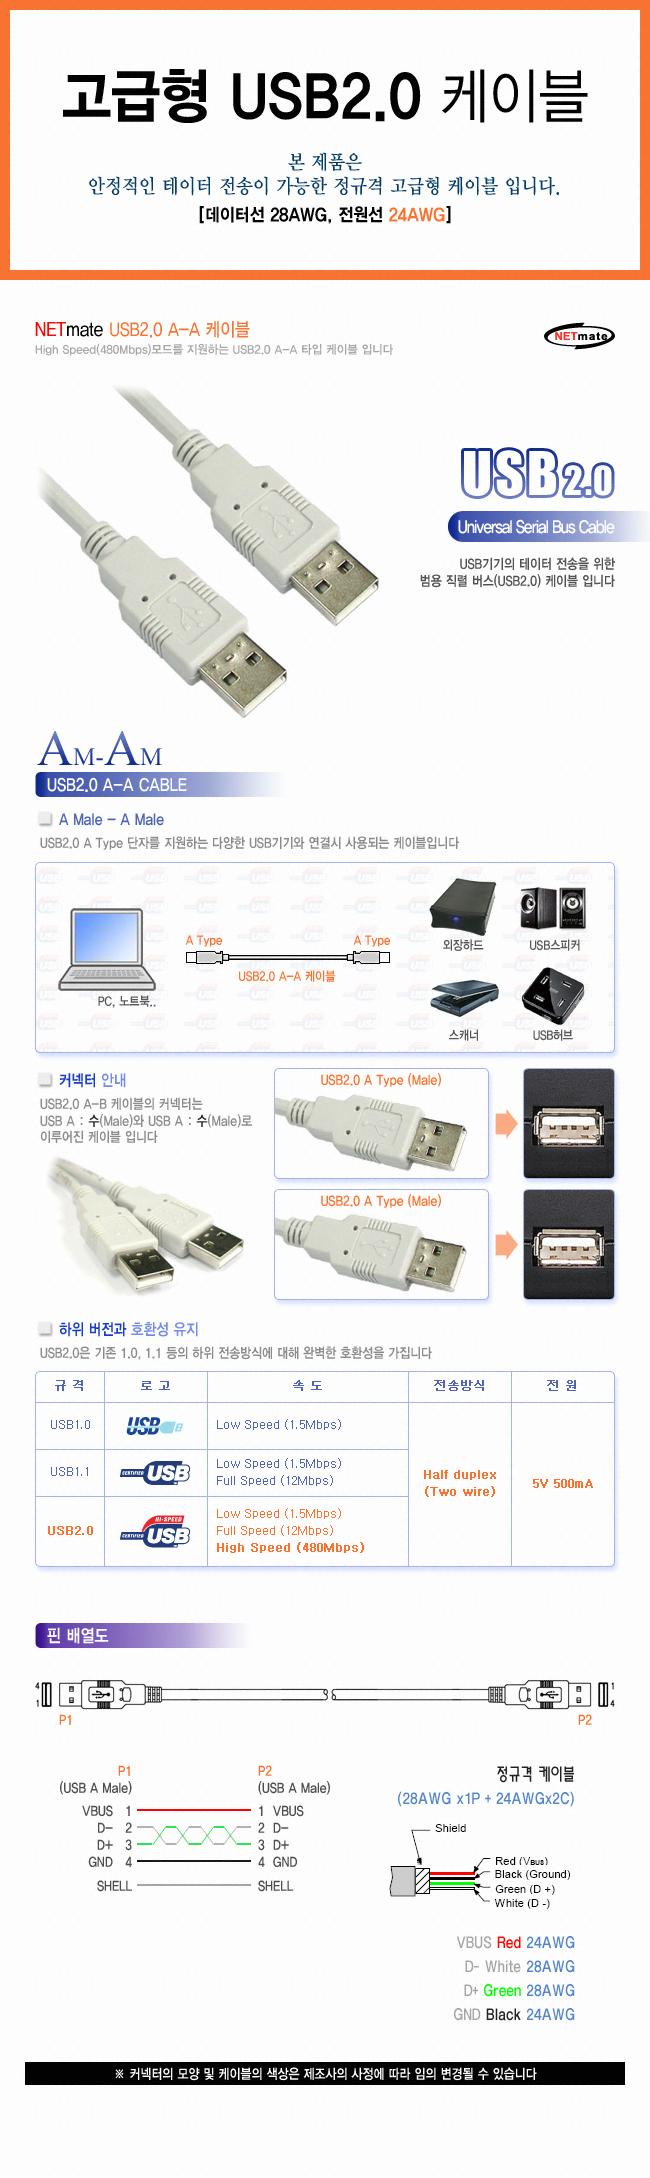 USB20_AA_10M_DB.jpg